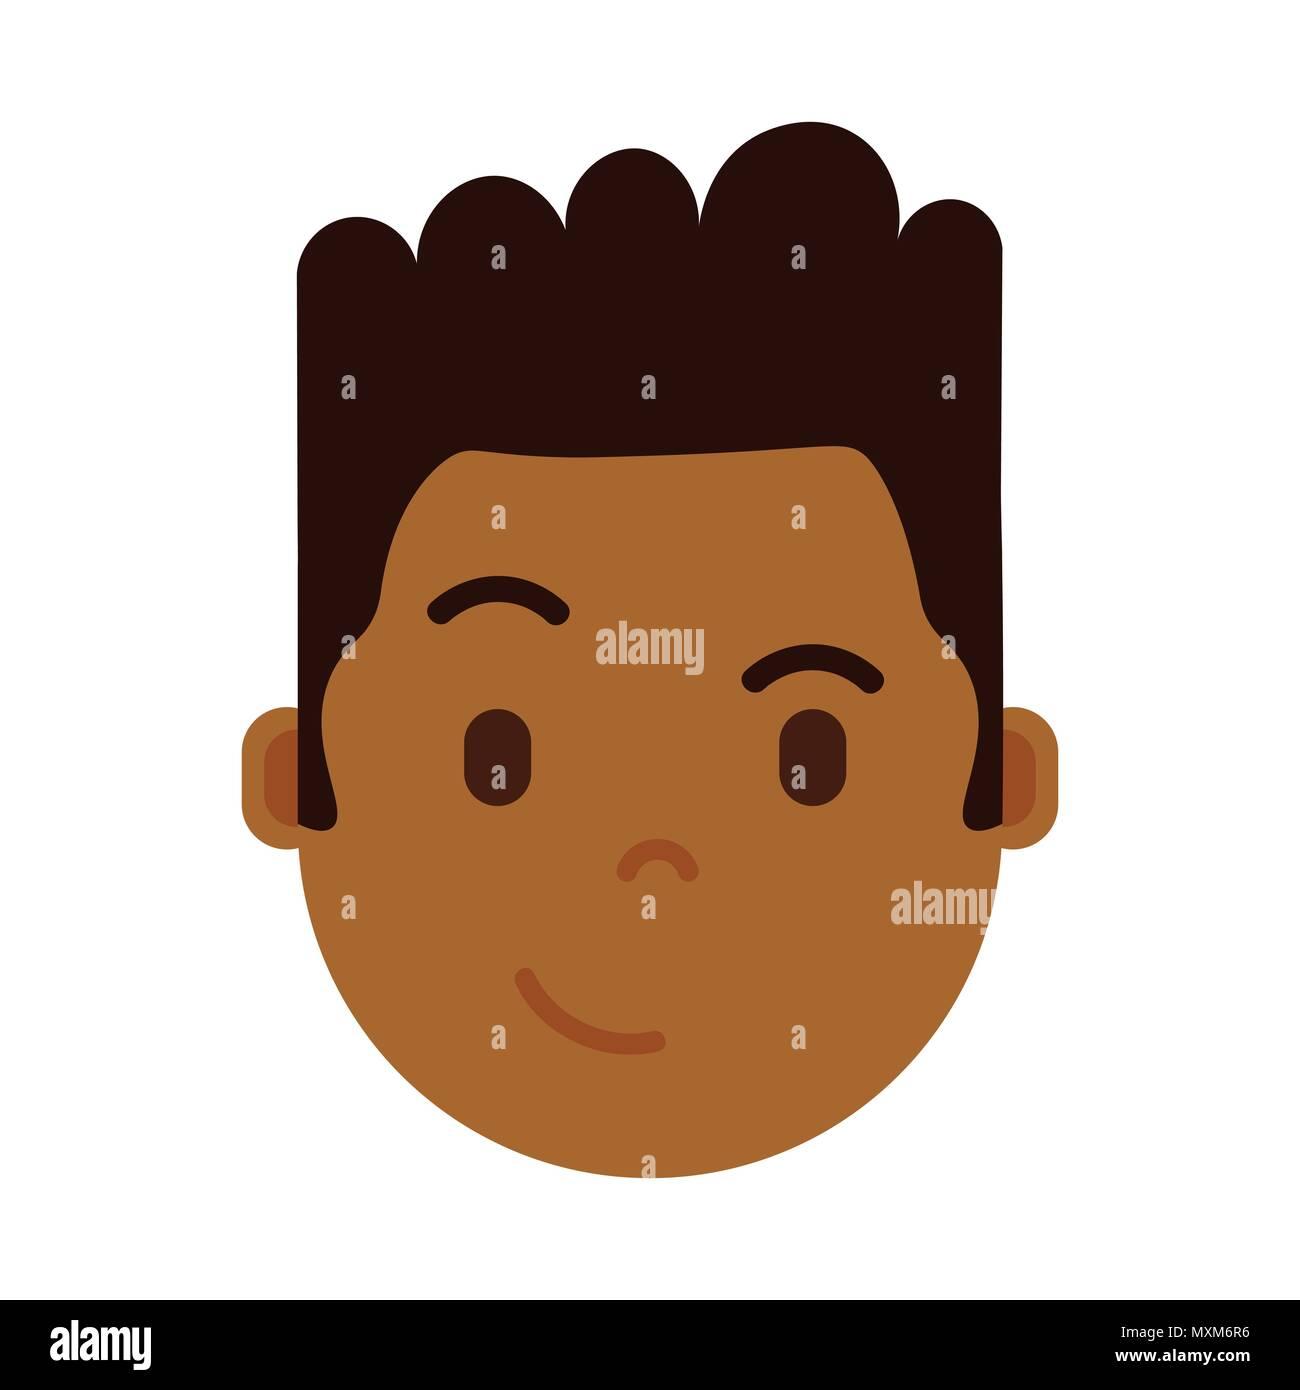 african boy head emoji personage icon with facial emotions